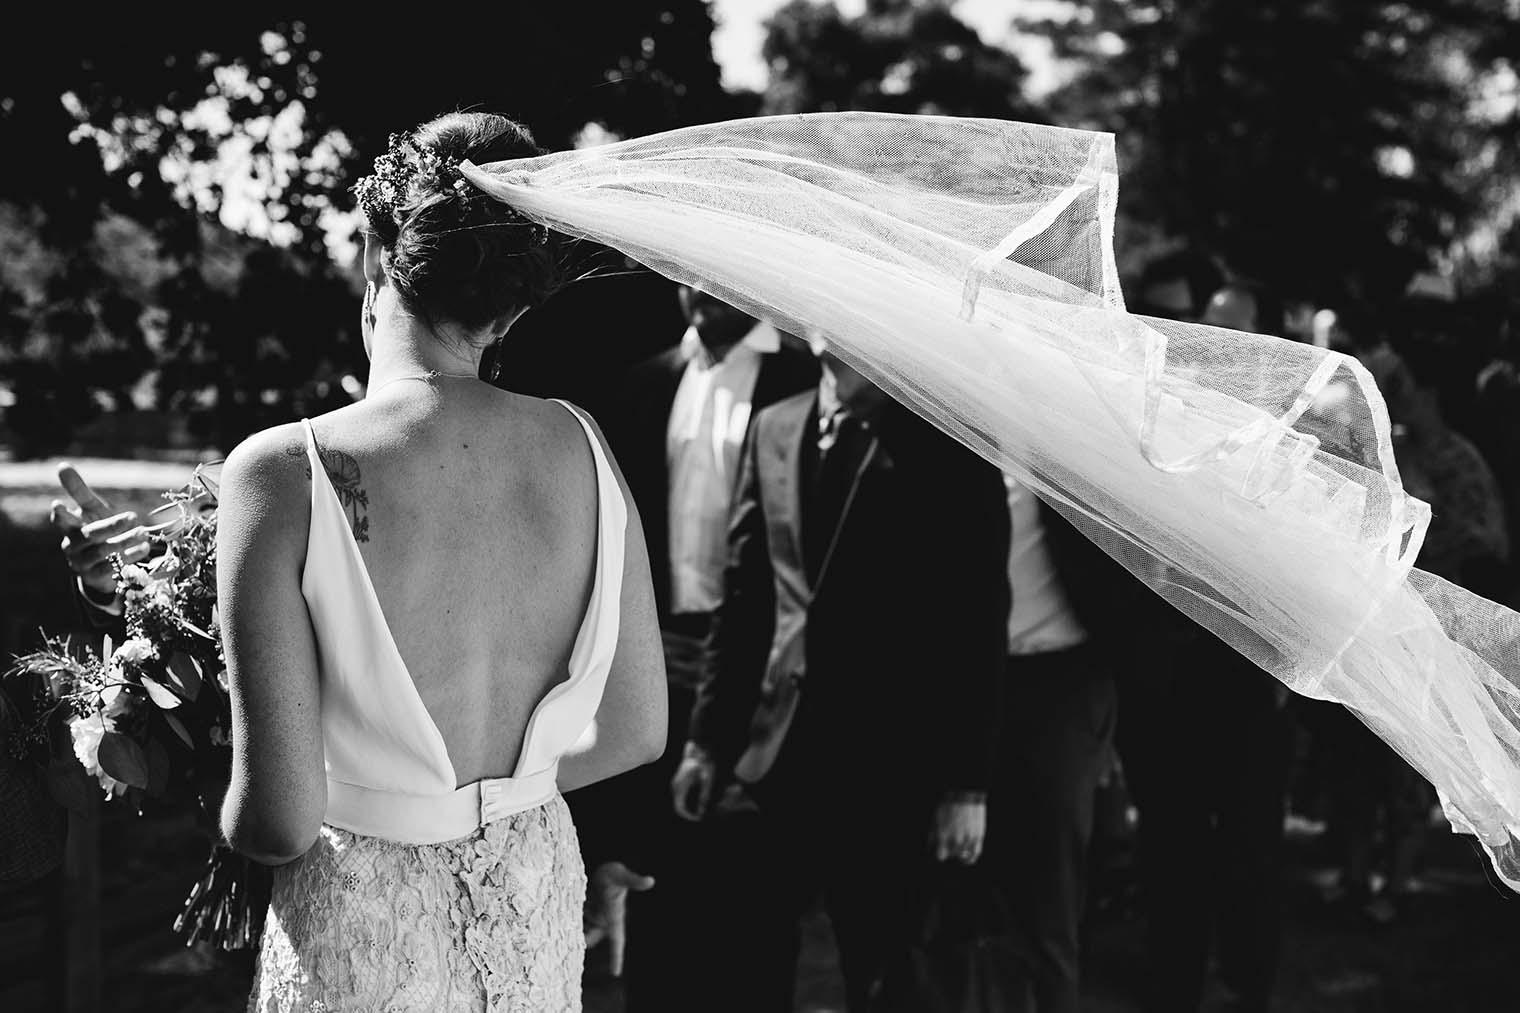 jack london state historic park wedding